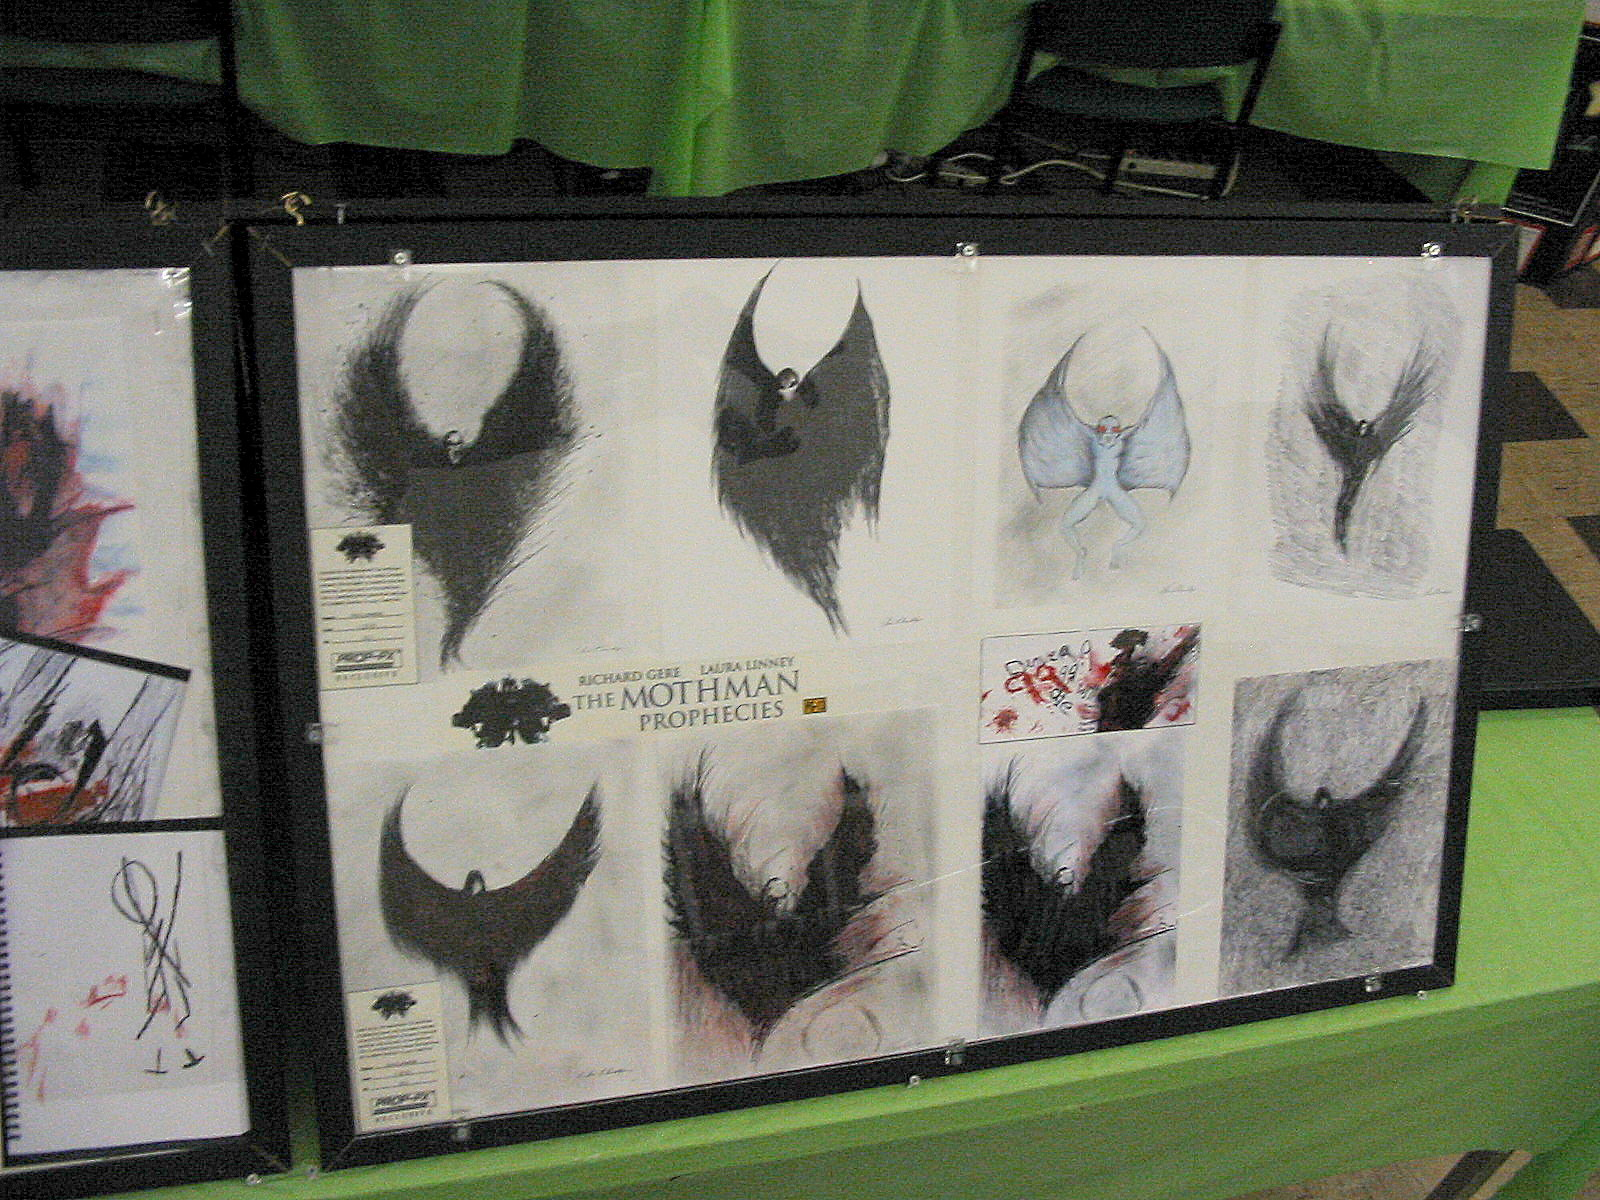 An image of Mothman inspired art.